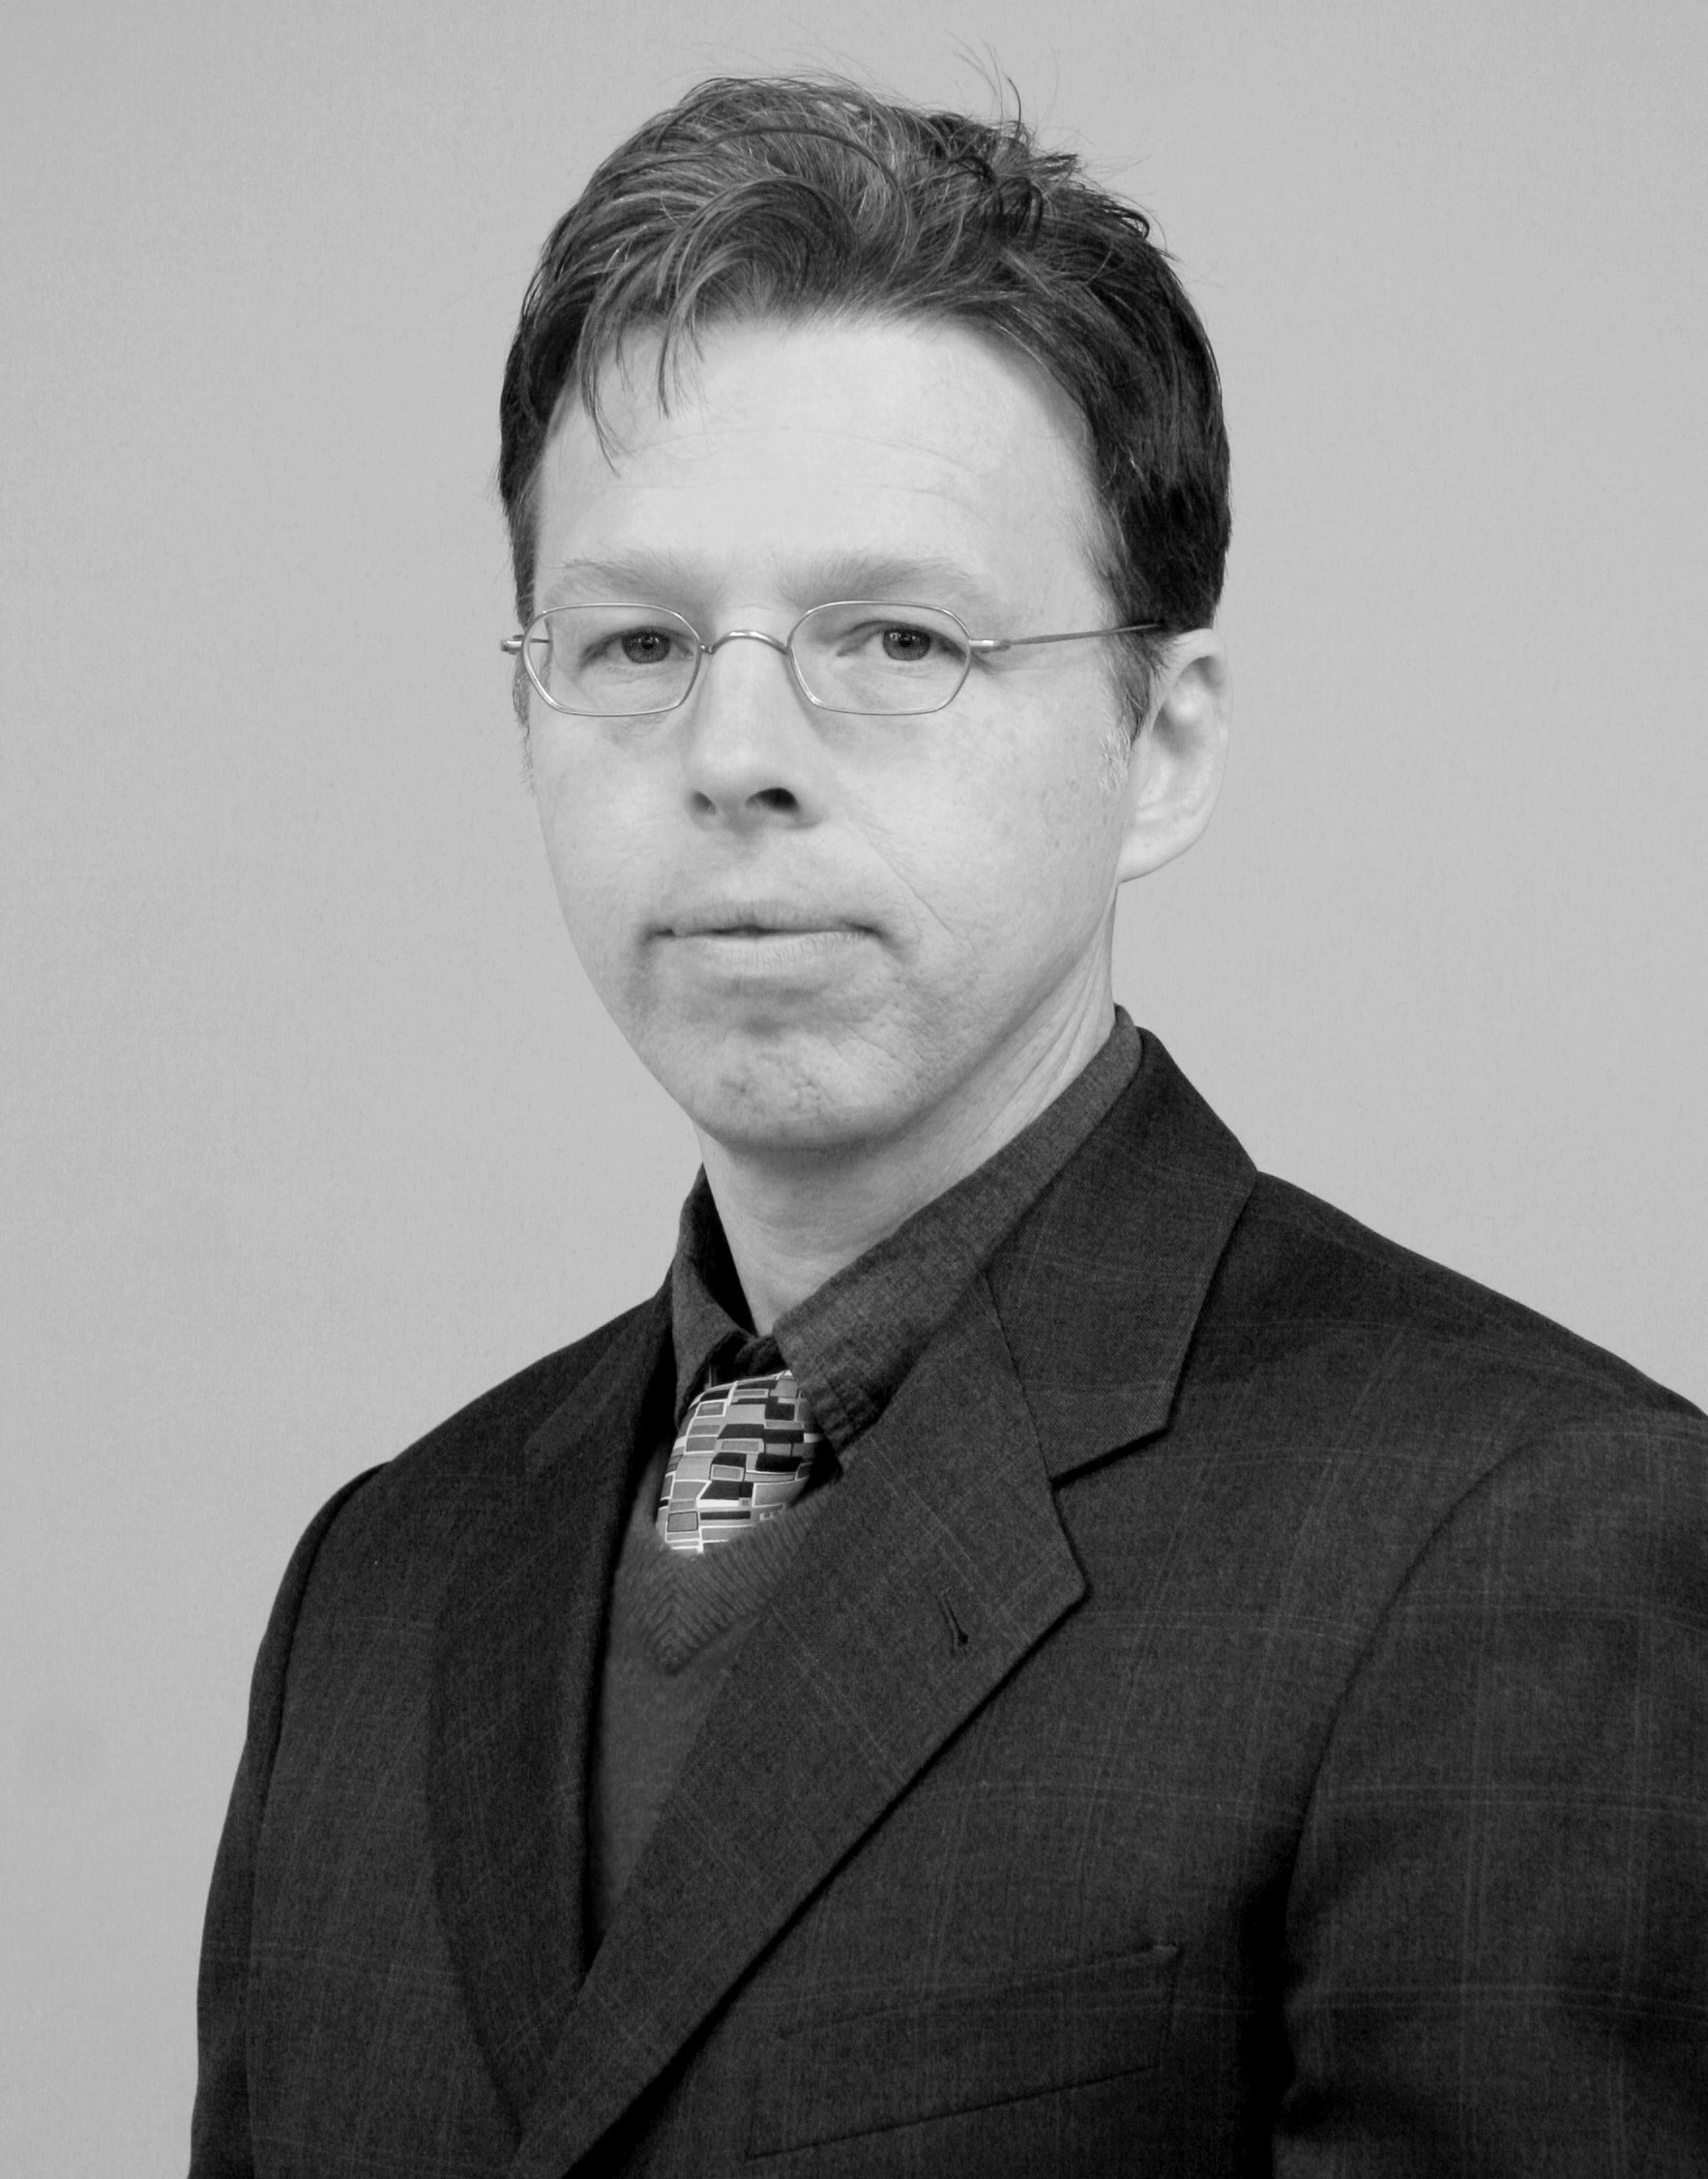 Nicholas Thorn, President